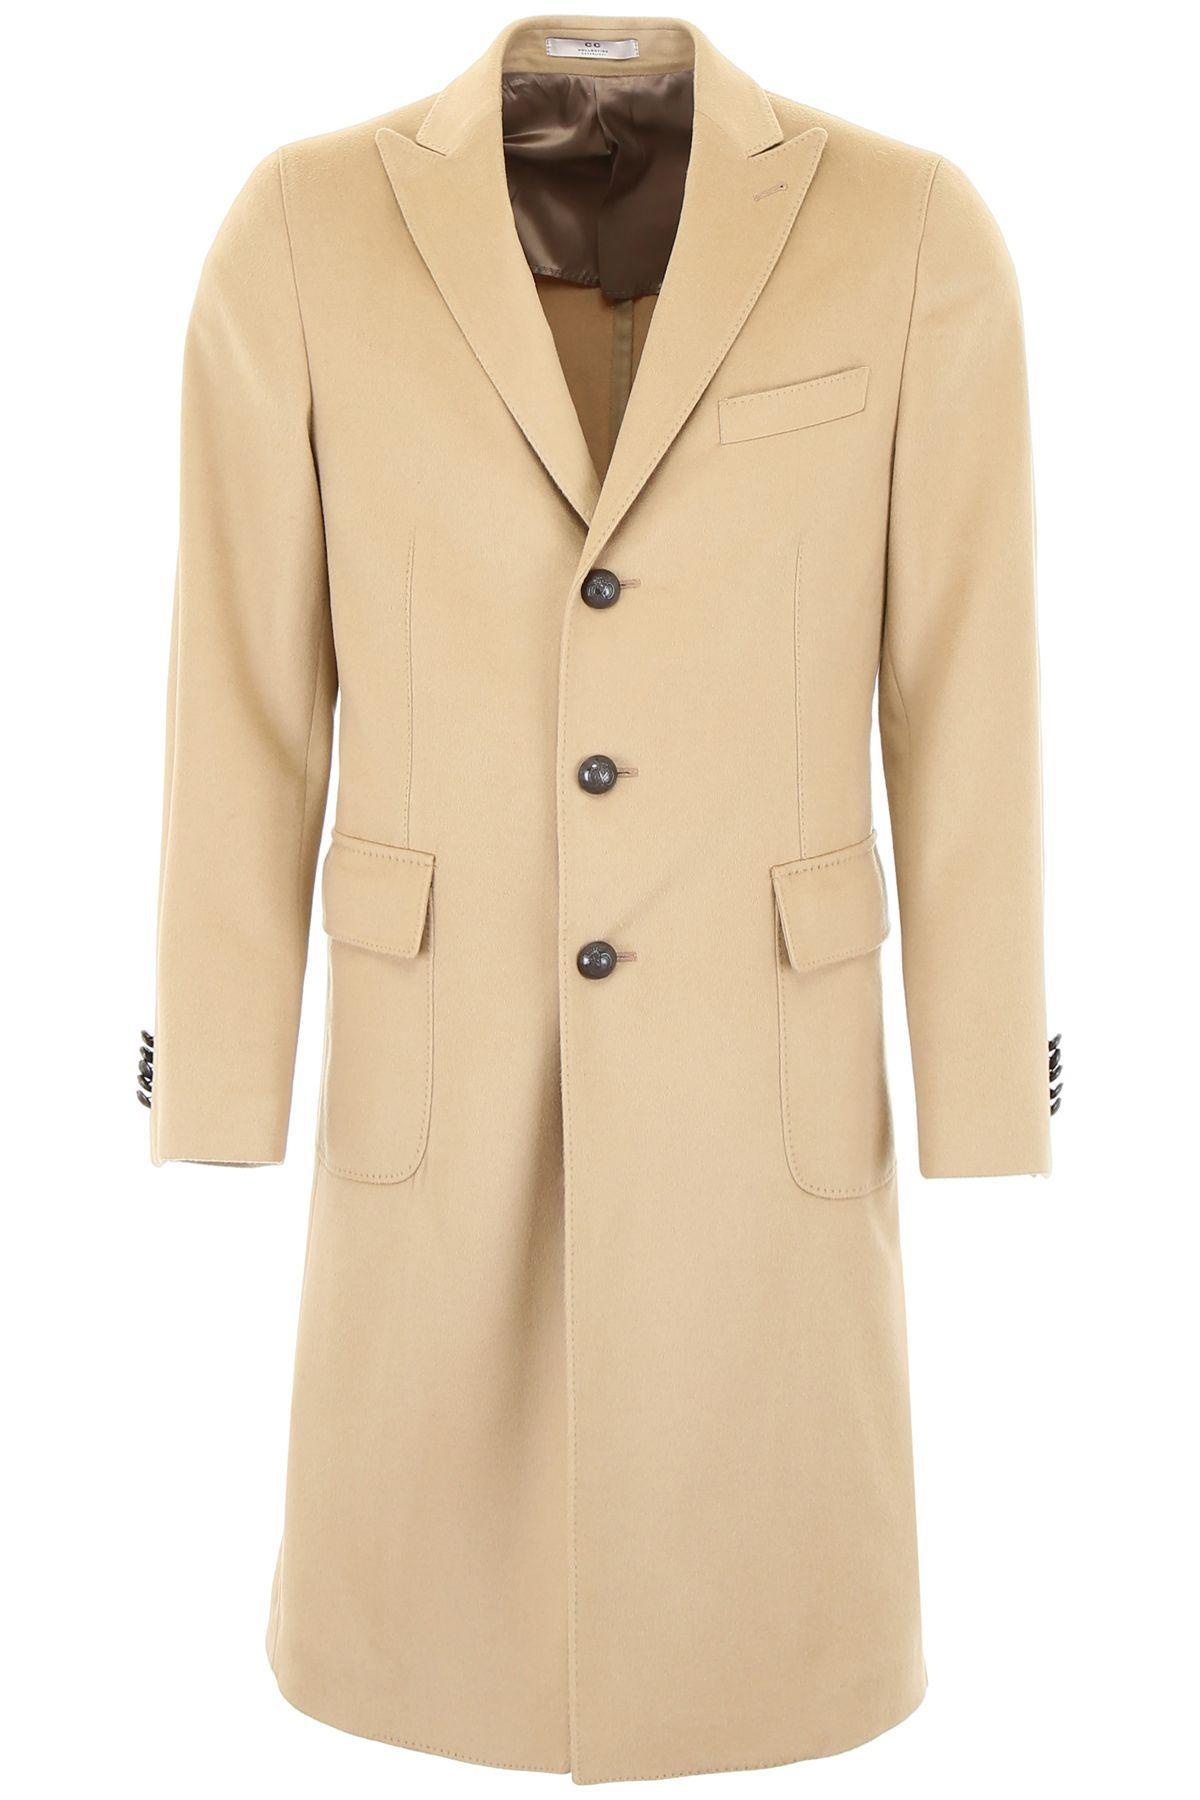 CC COLLECTION CORNELIANI Wool Coat in Beige